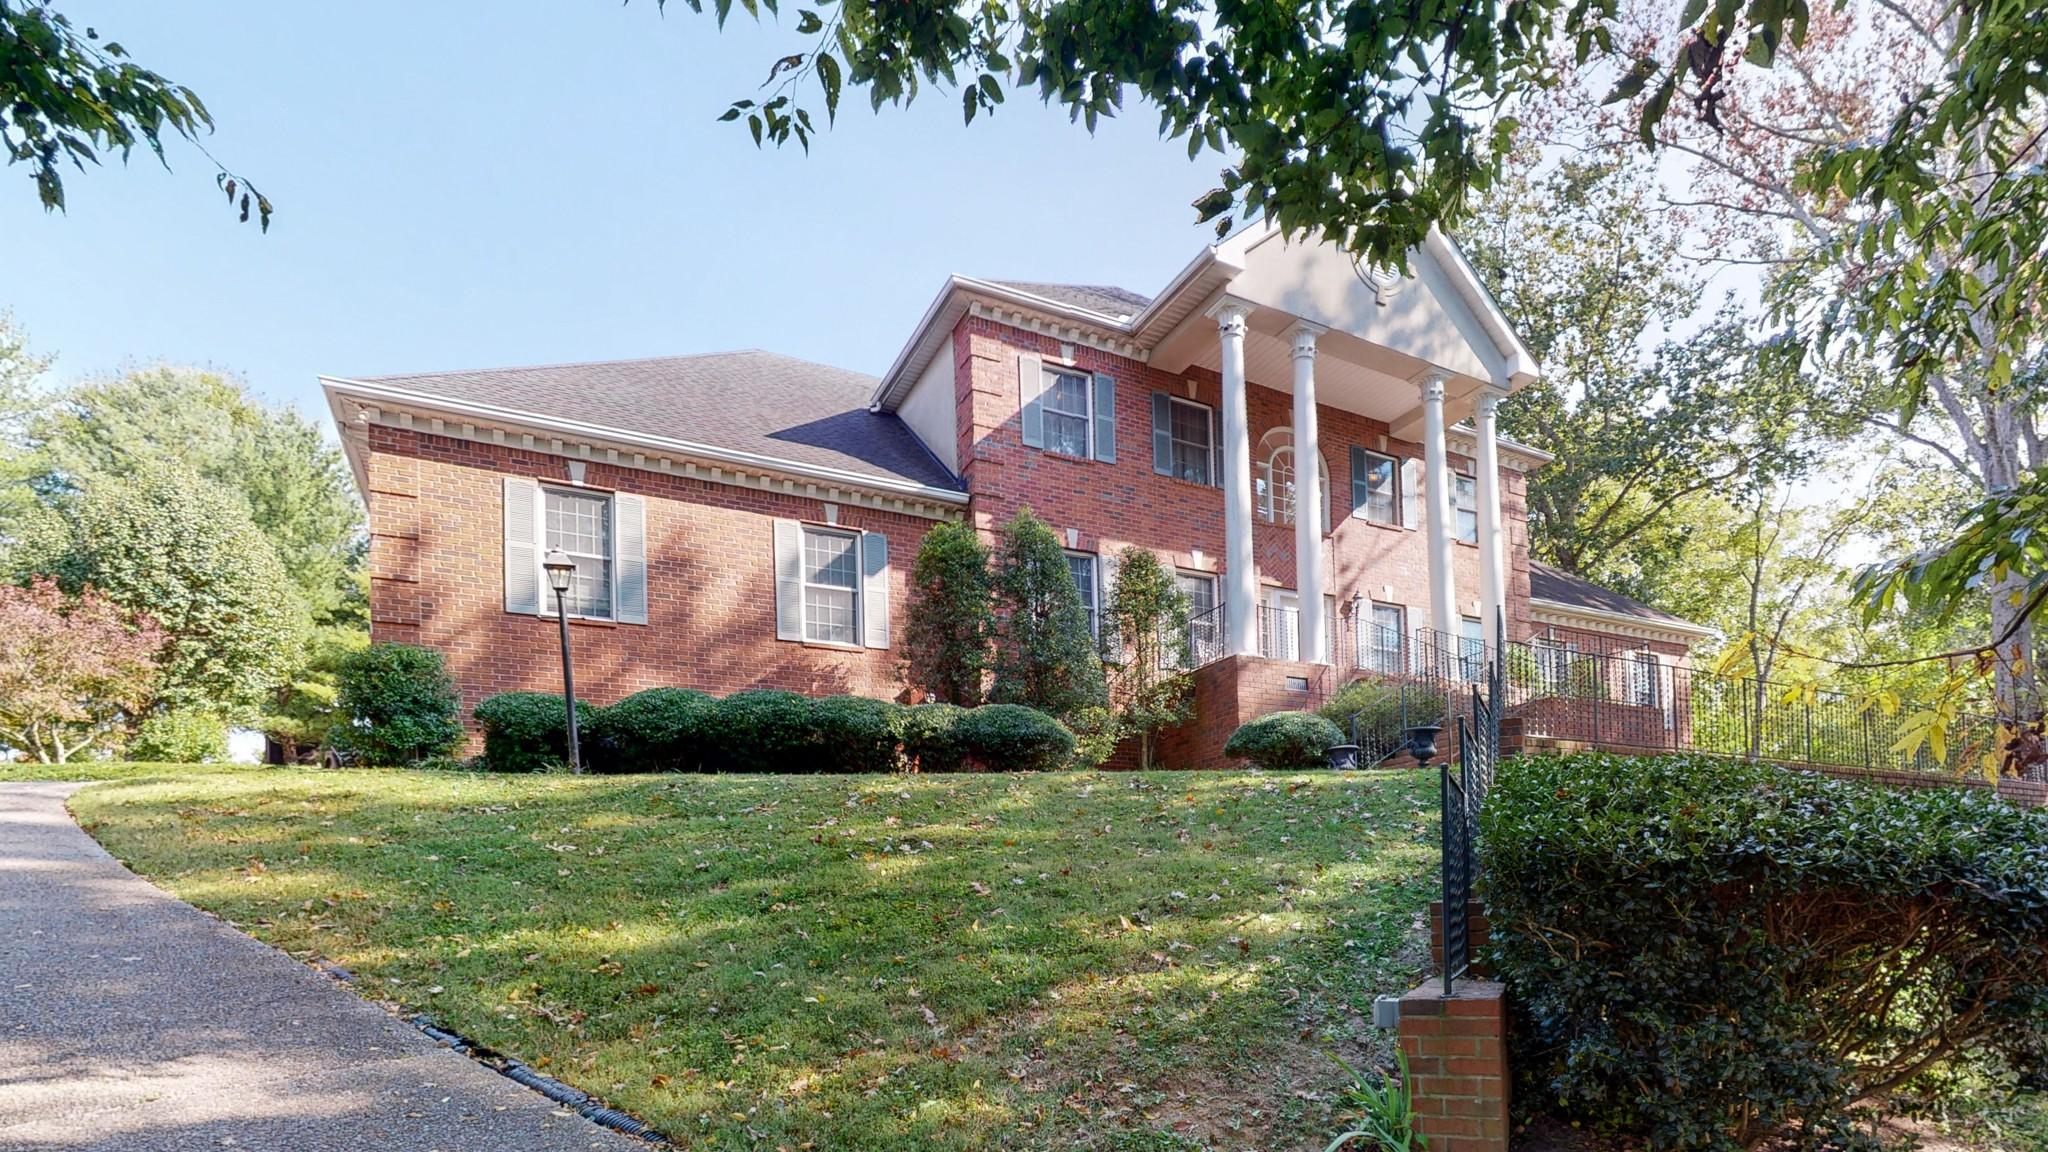 533 Natalie Dr Property Photo - Goodlettsville, TN real estate listing